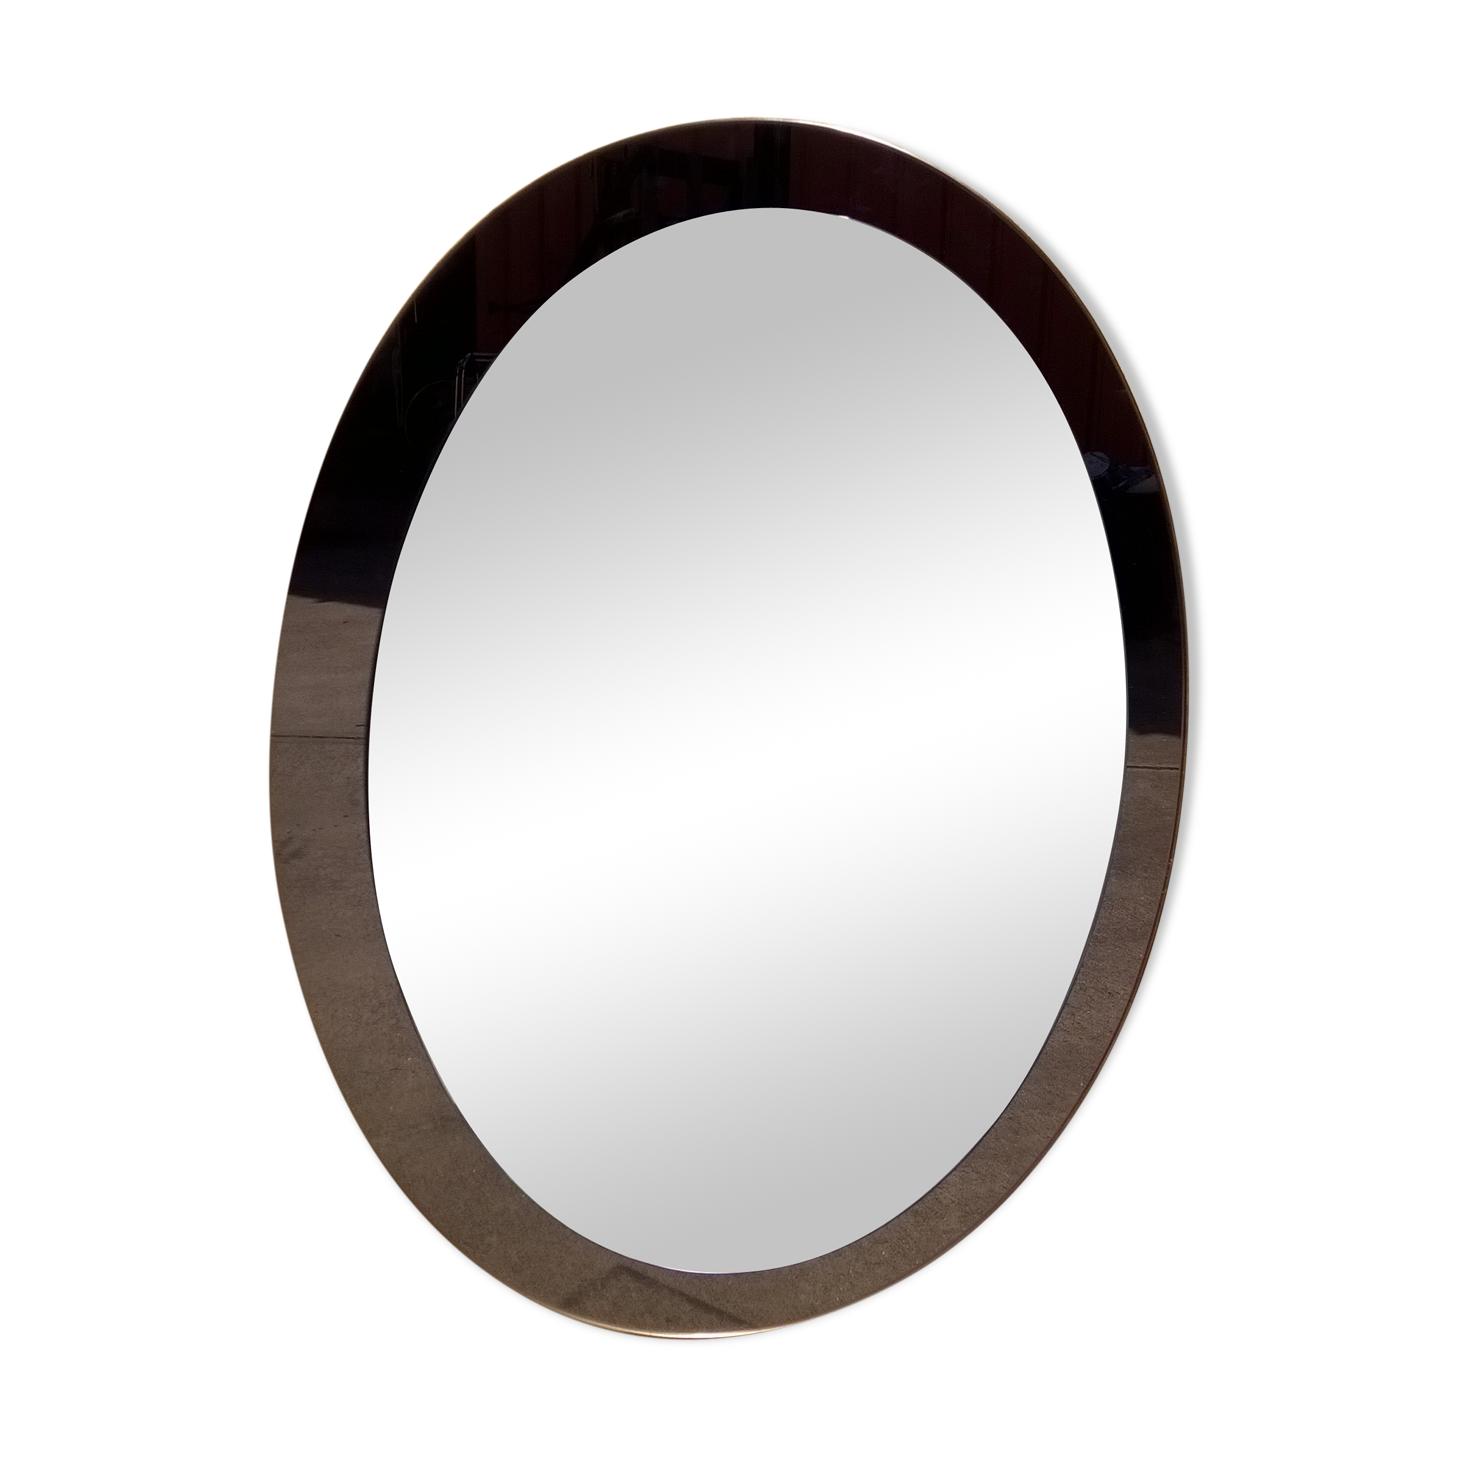 Miroir ovale cristal luxor par Antonio Lupi